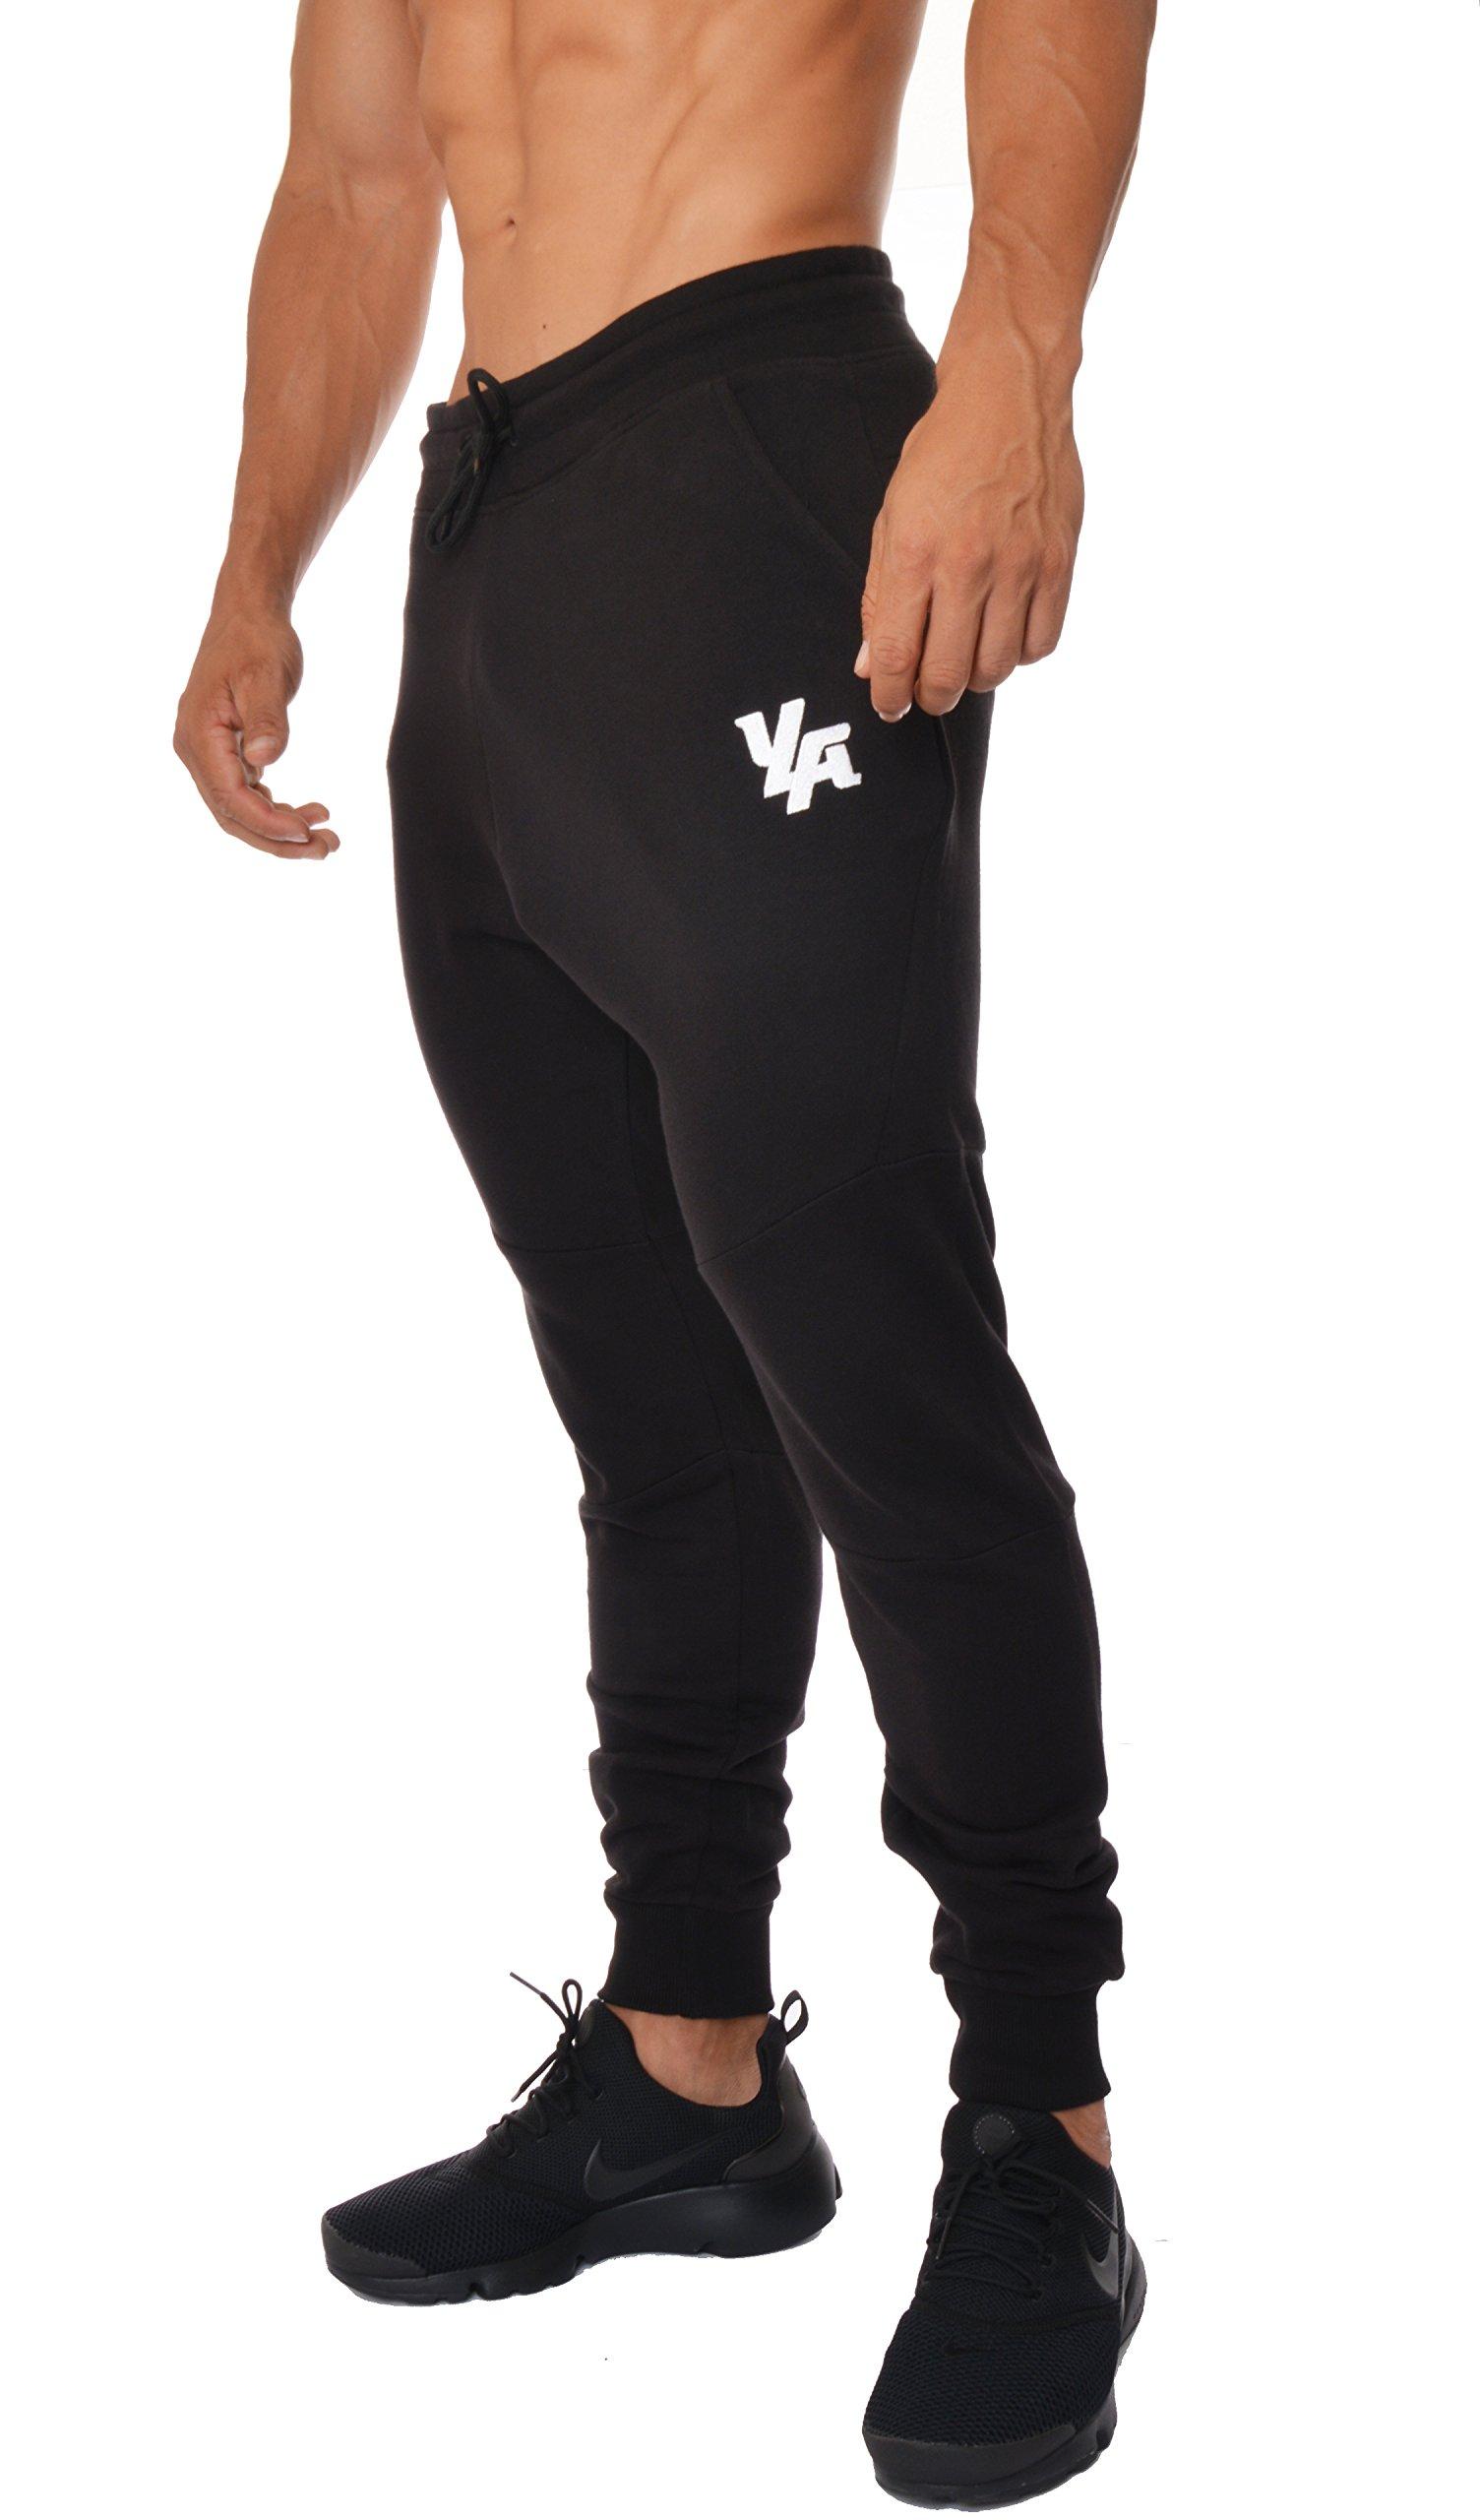 YoungLA French Terry Cotton Sweatpants Jogger Pants Black XX-Large